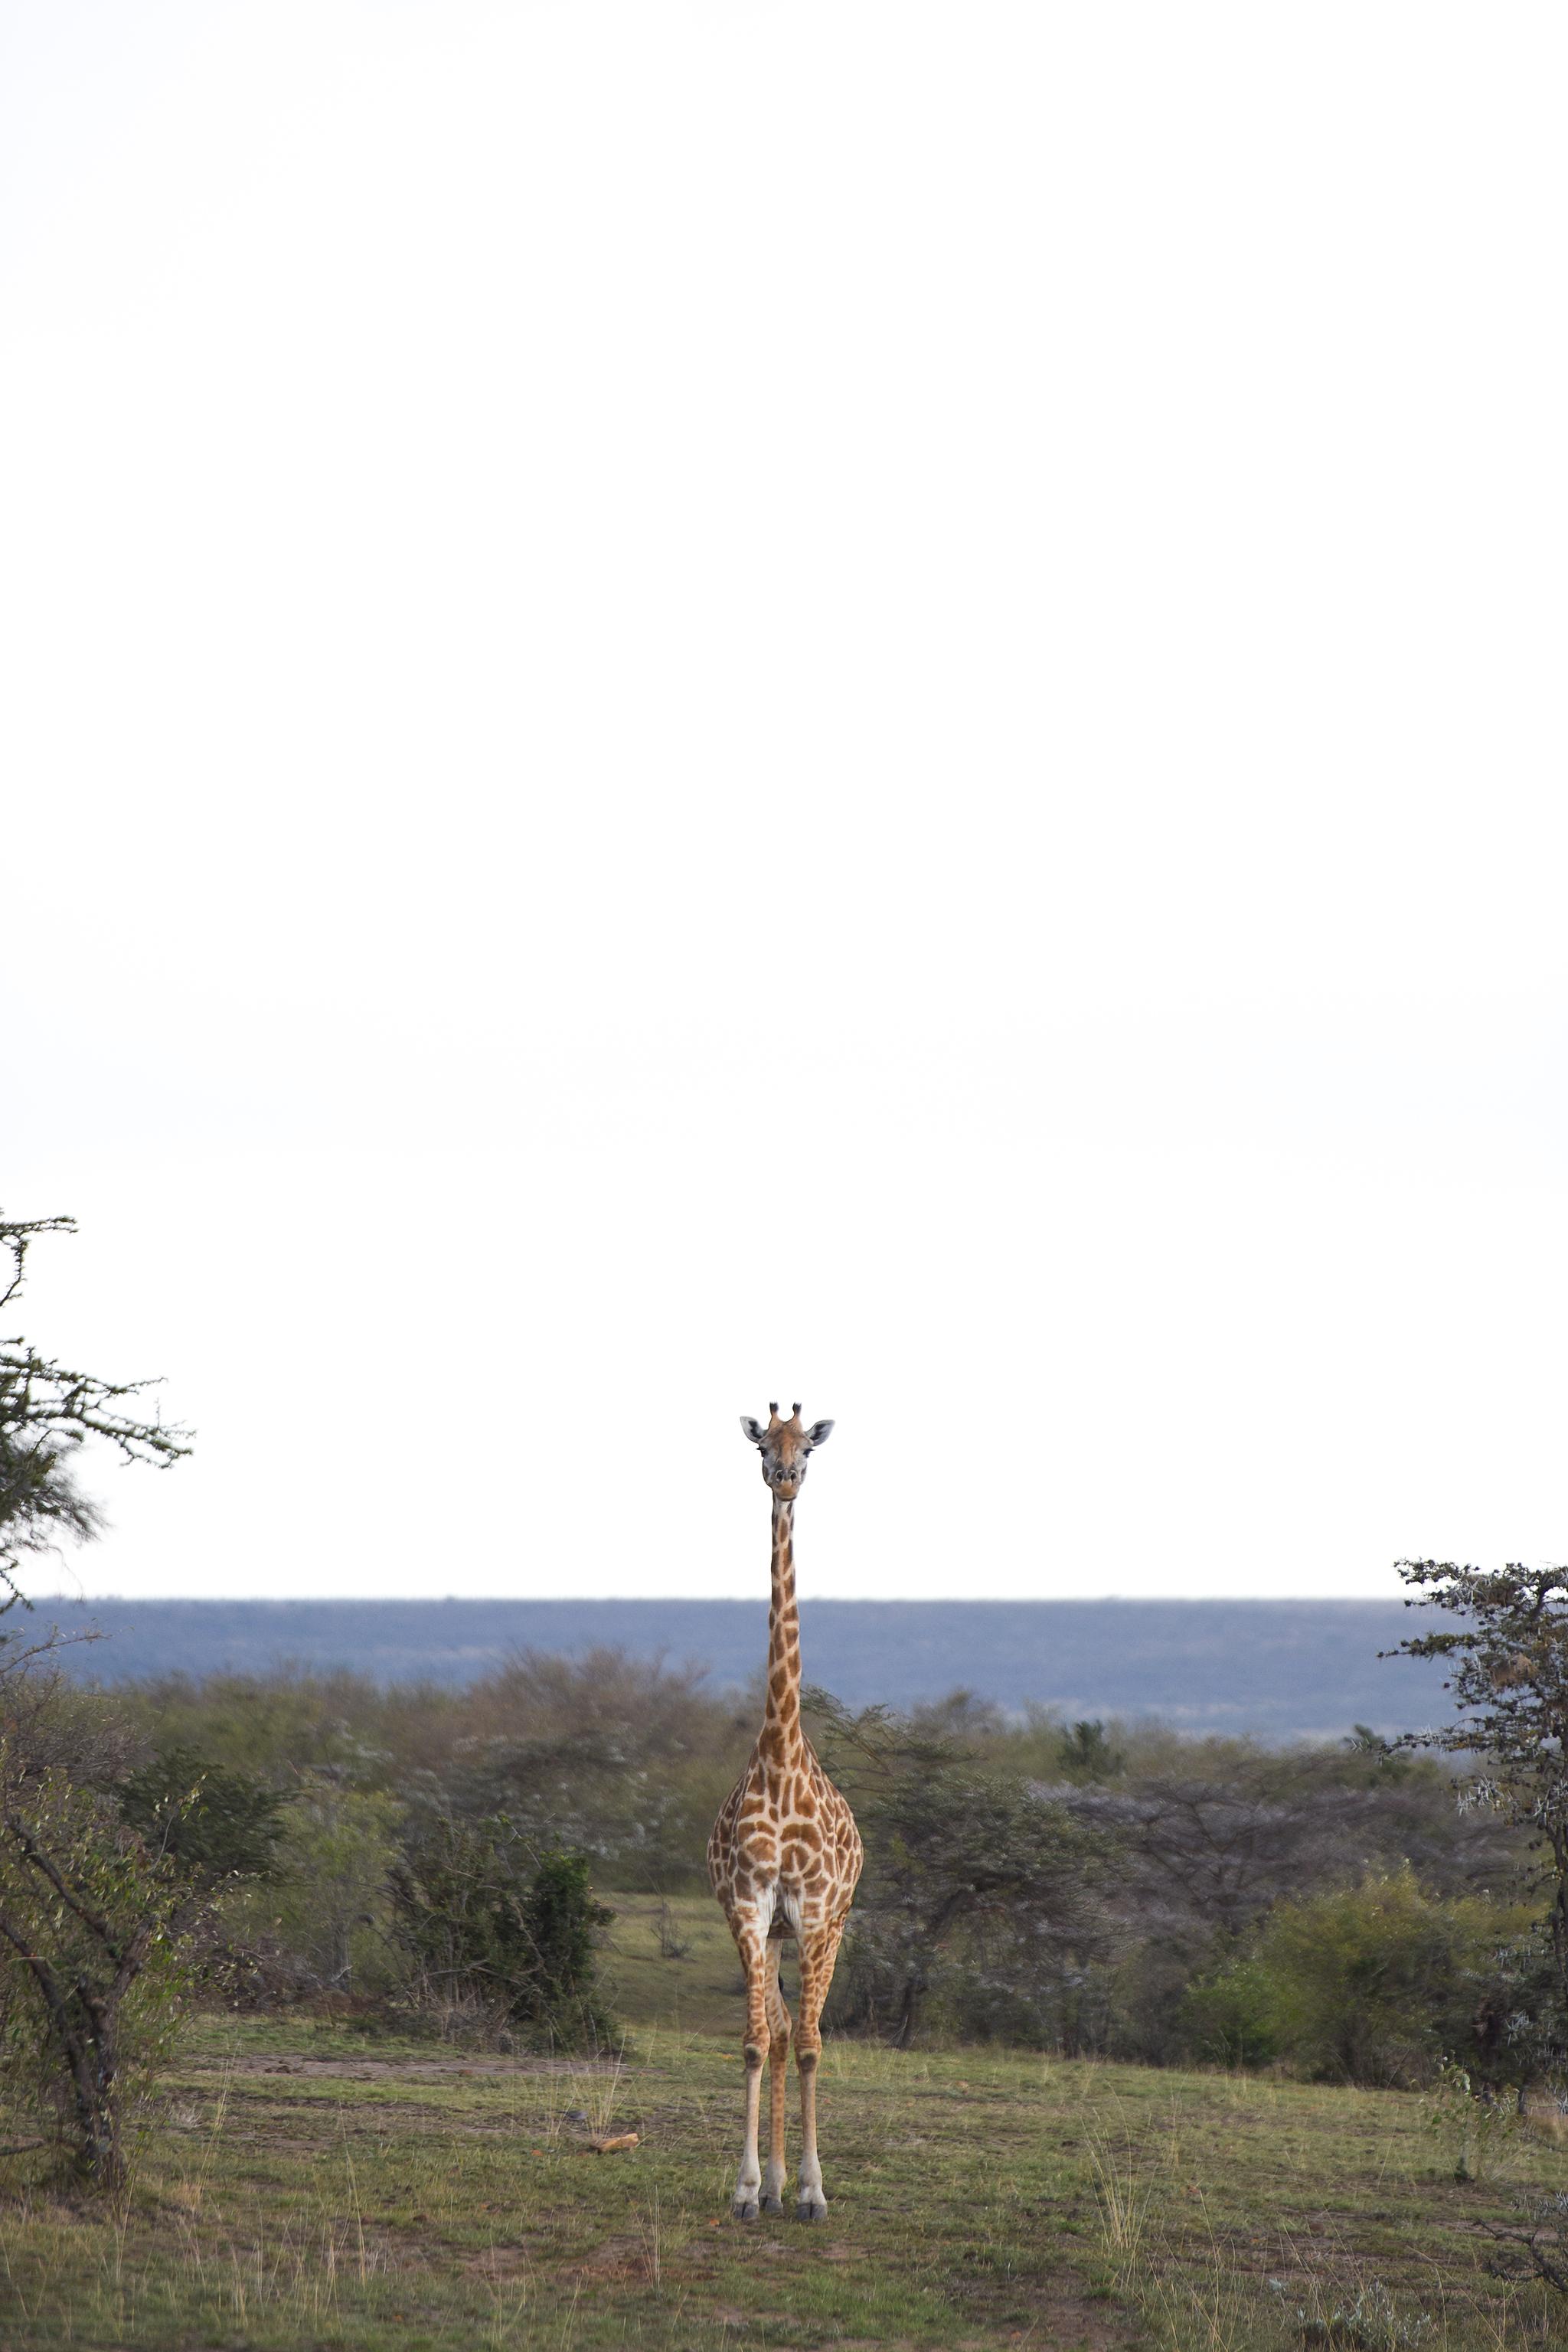 A Masai giraffe in Nashulai Conservancy.